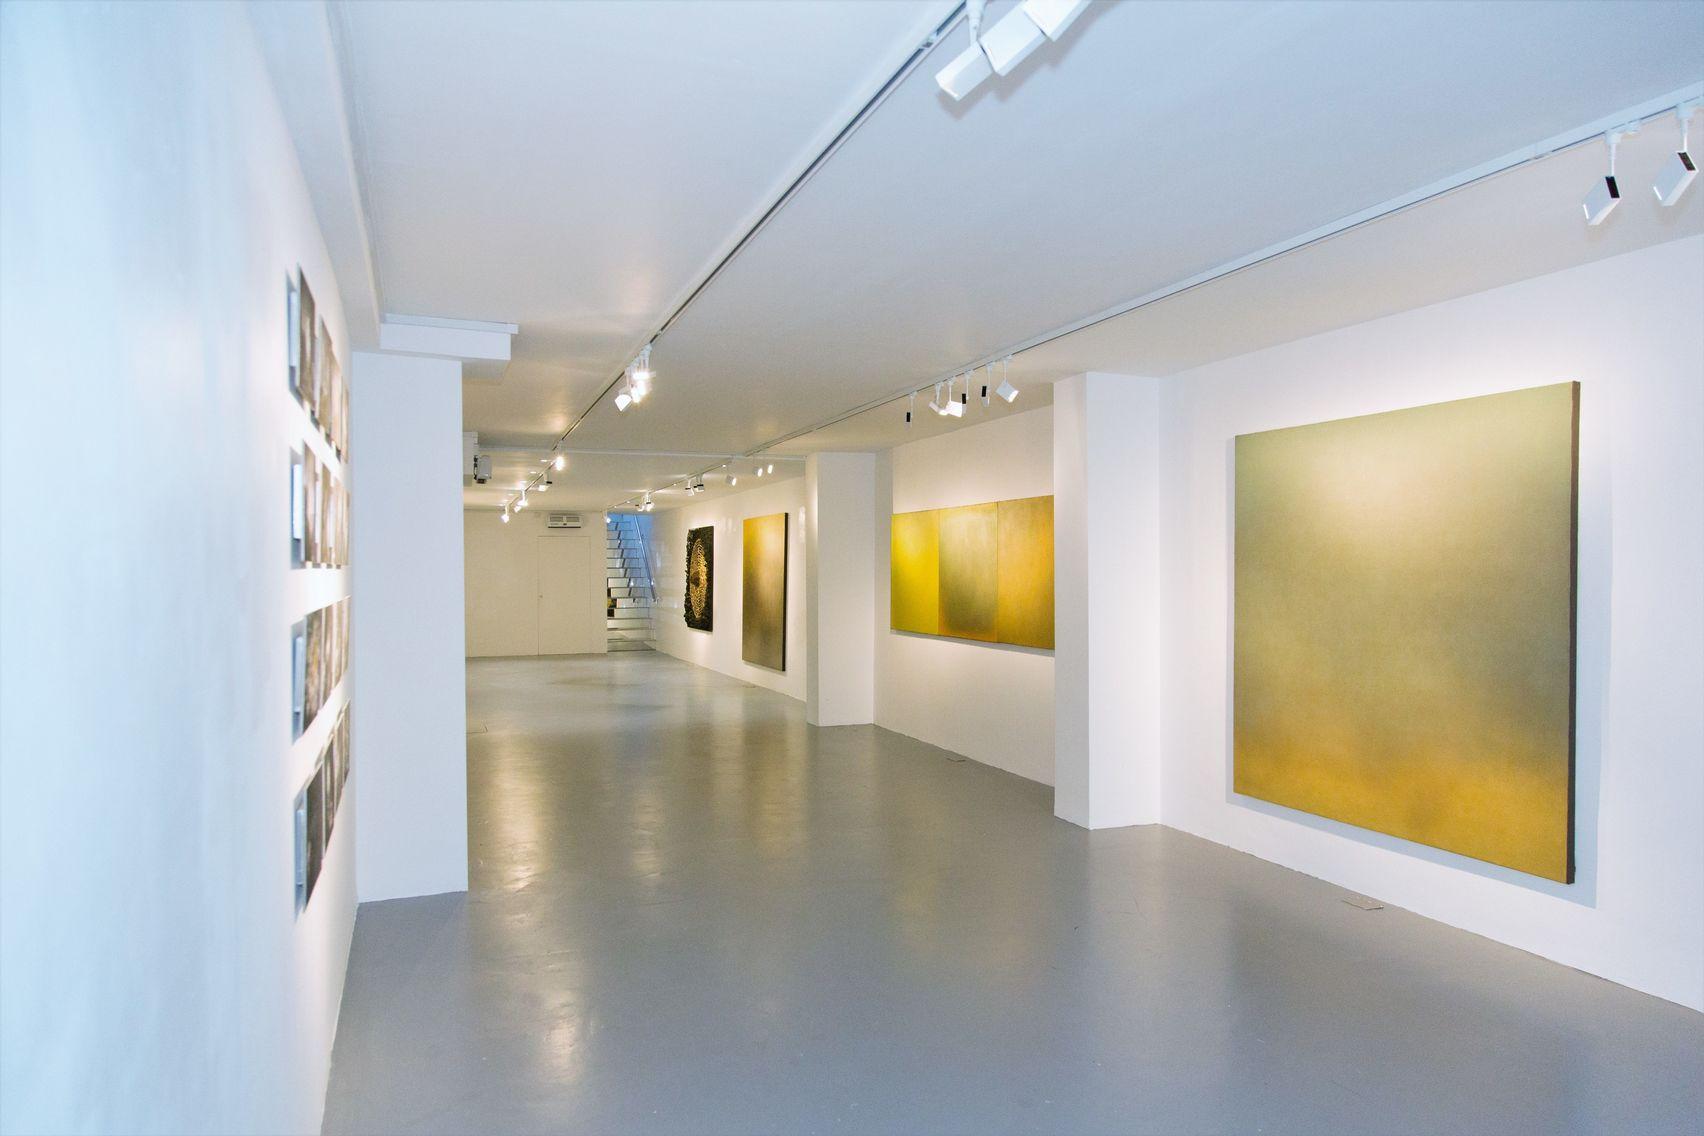 Gallery, Amar Gallery